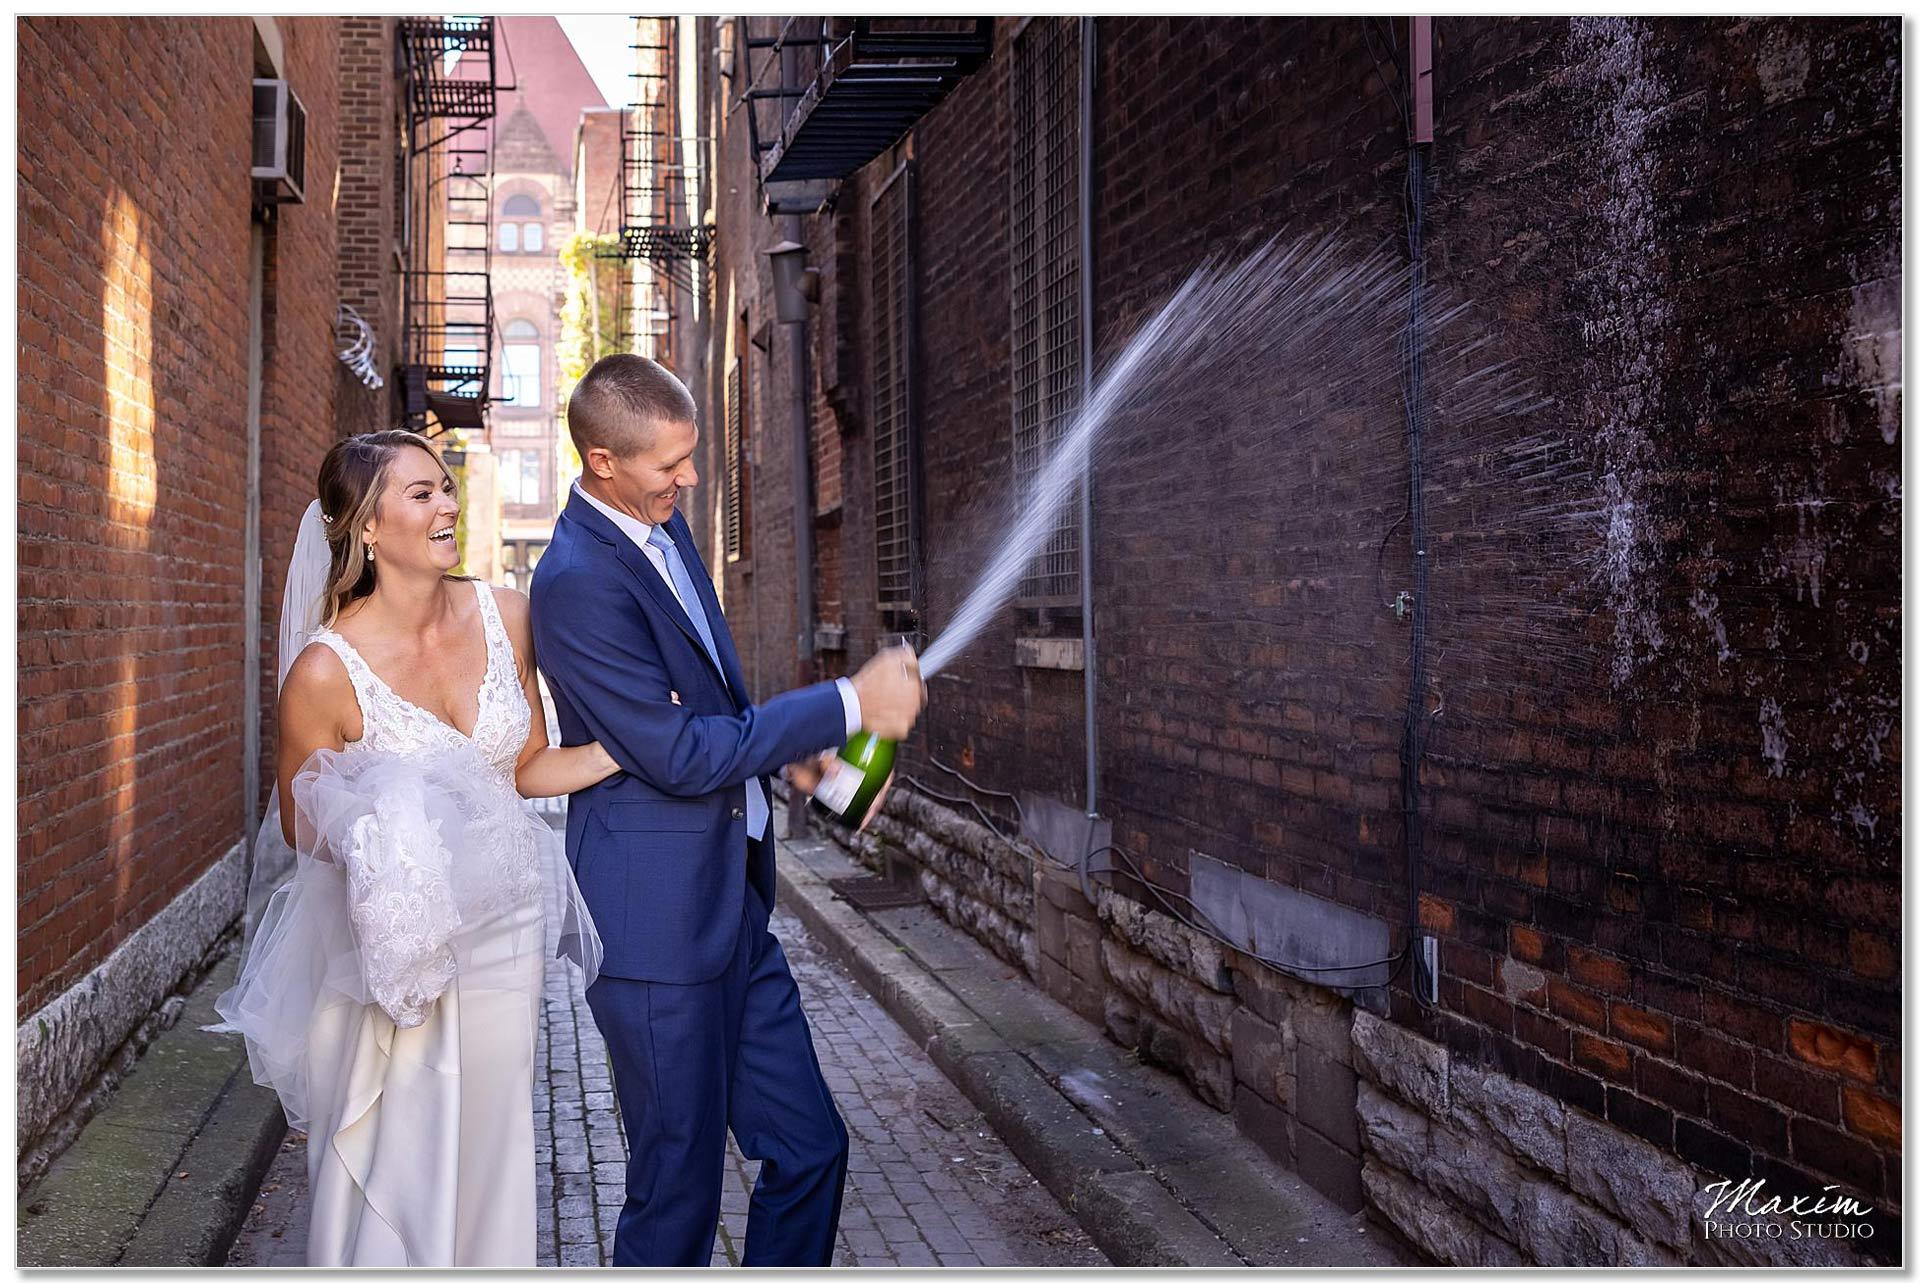 Downtown Cincinnati alley champagne toast